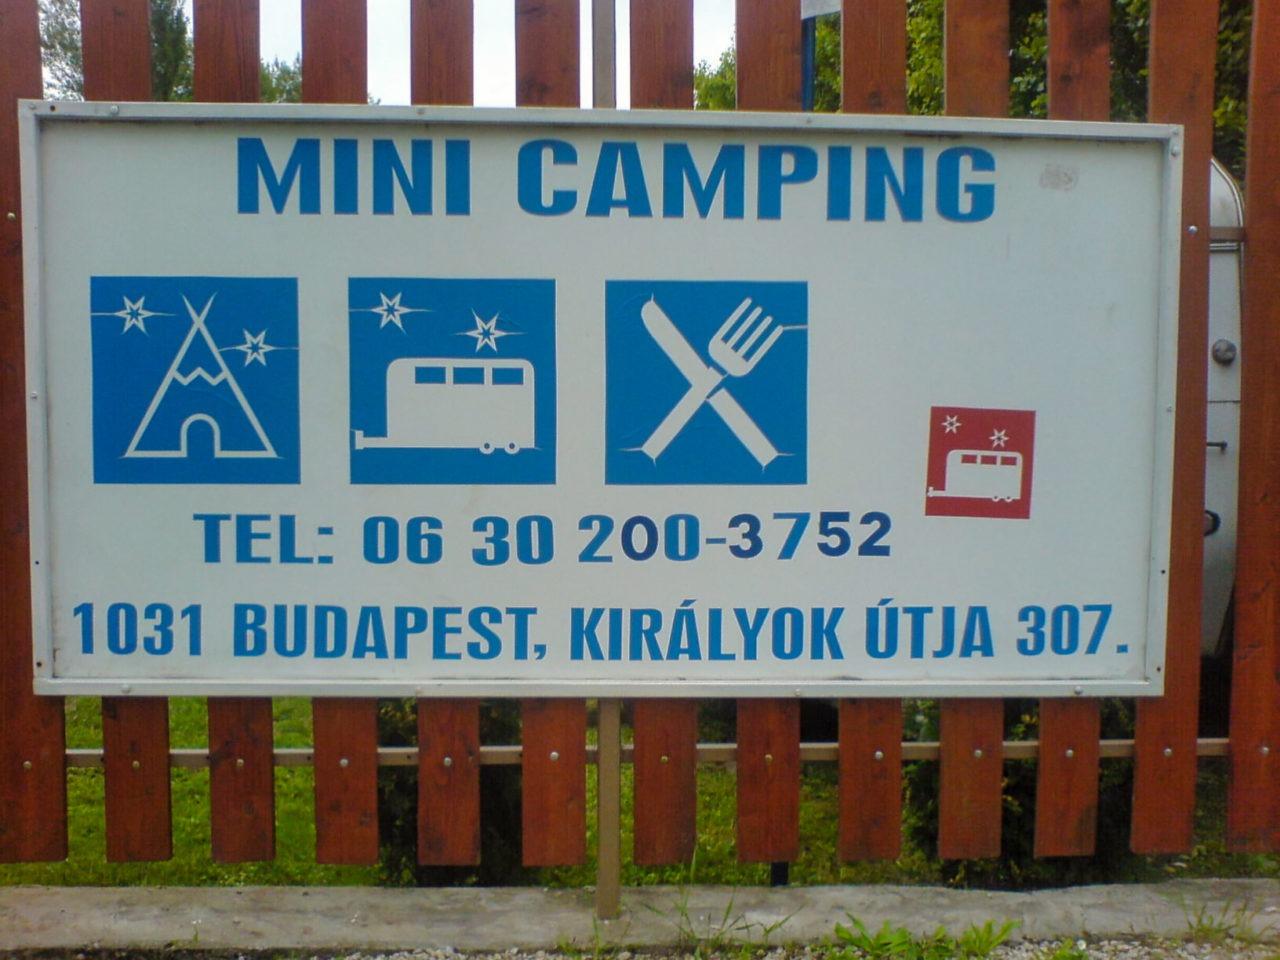 De mini camping in Budapest Hongarije